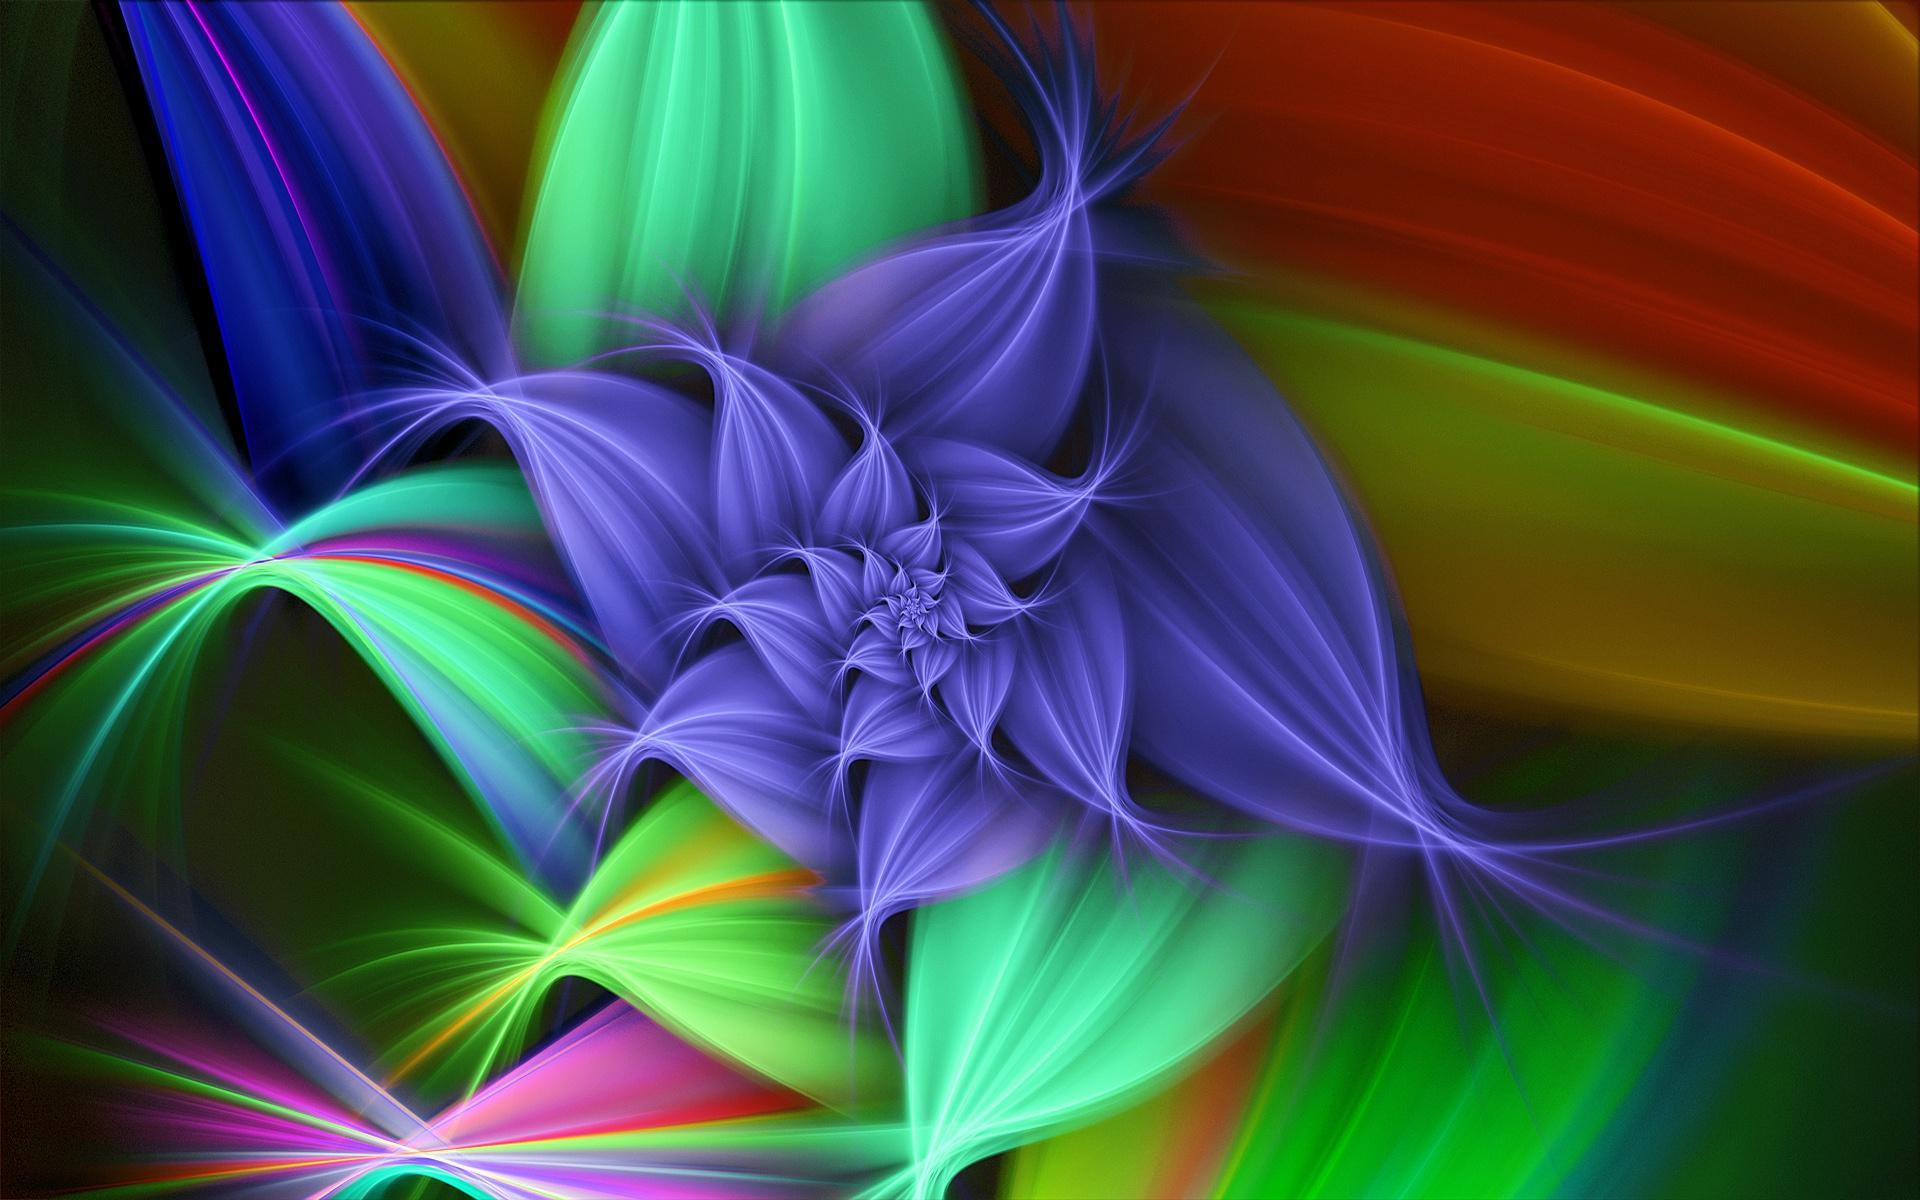 3D Abstract Flower wallpaper desktop background in 1920x1200 HD 1920x1200